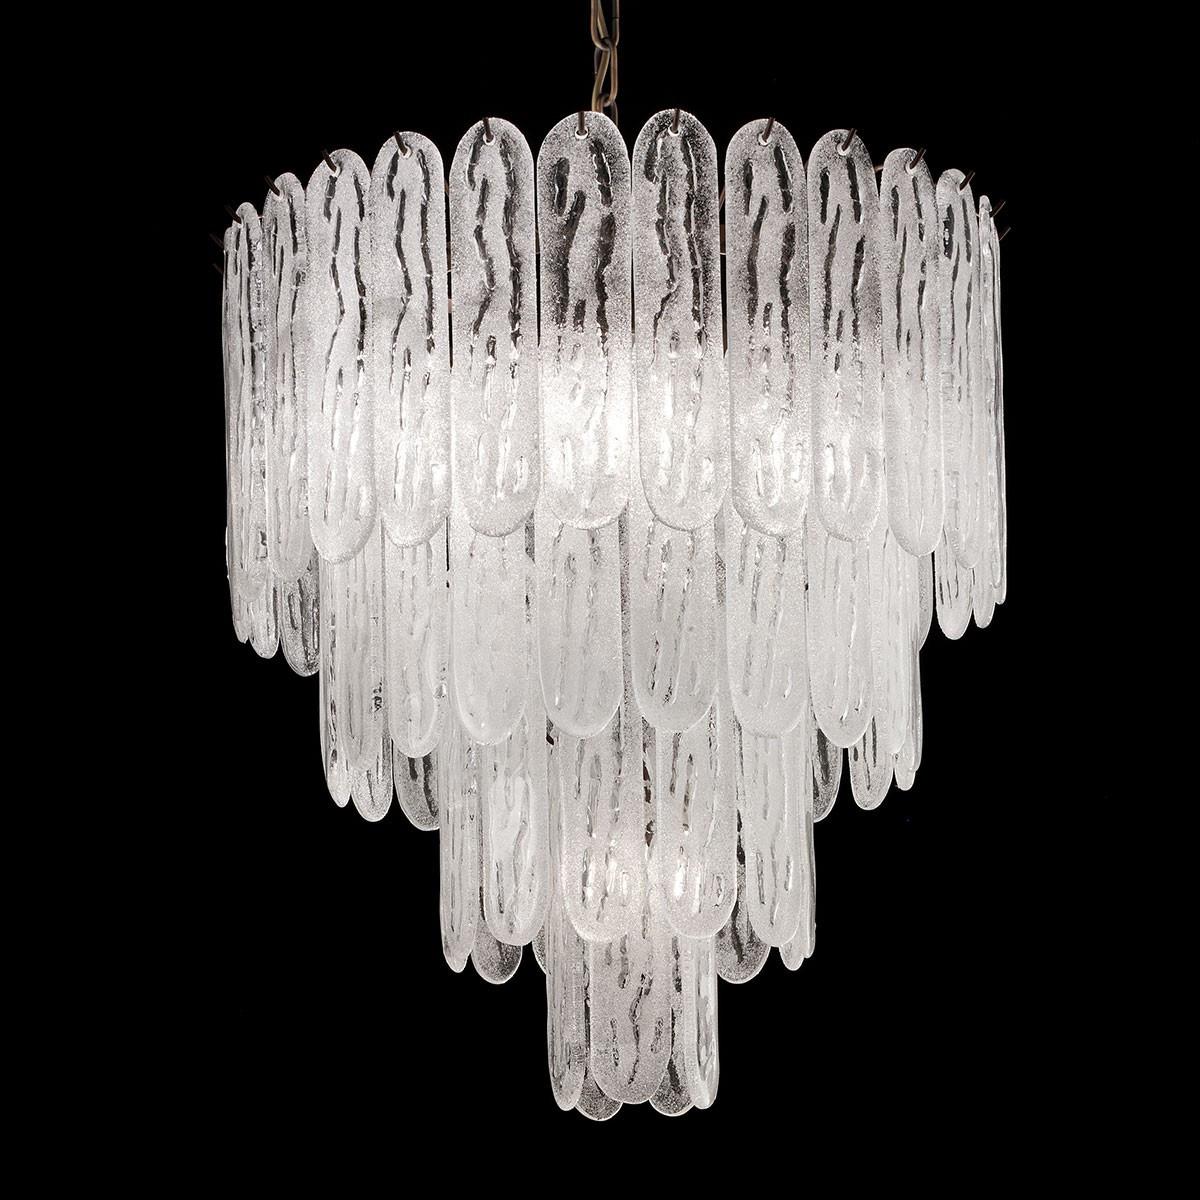 """Ivie"" Murano glass chandelier - 5 lights - white and bronze"